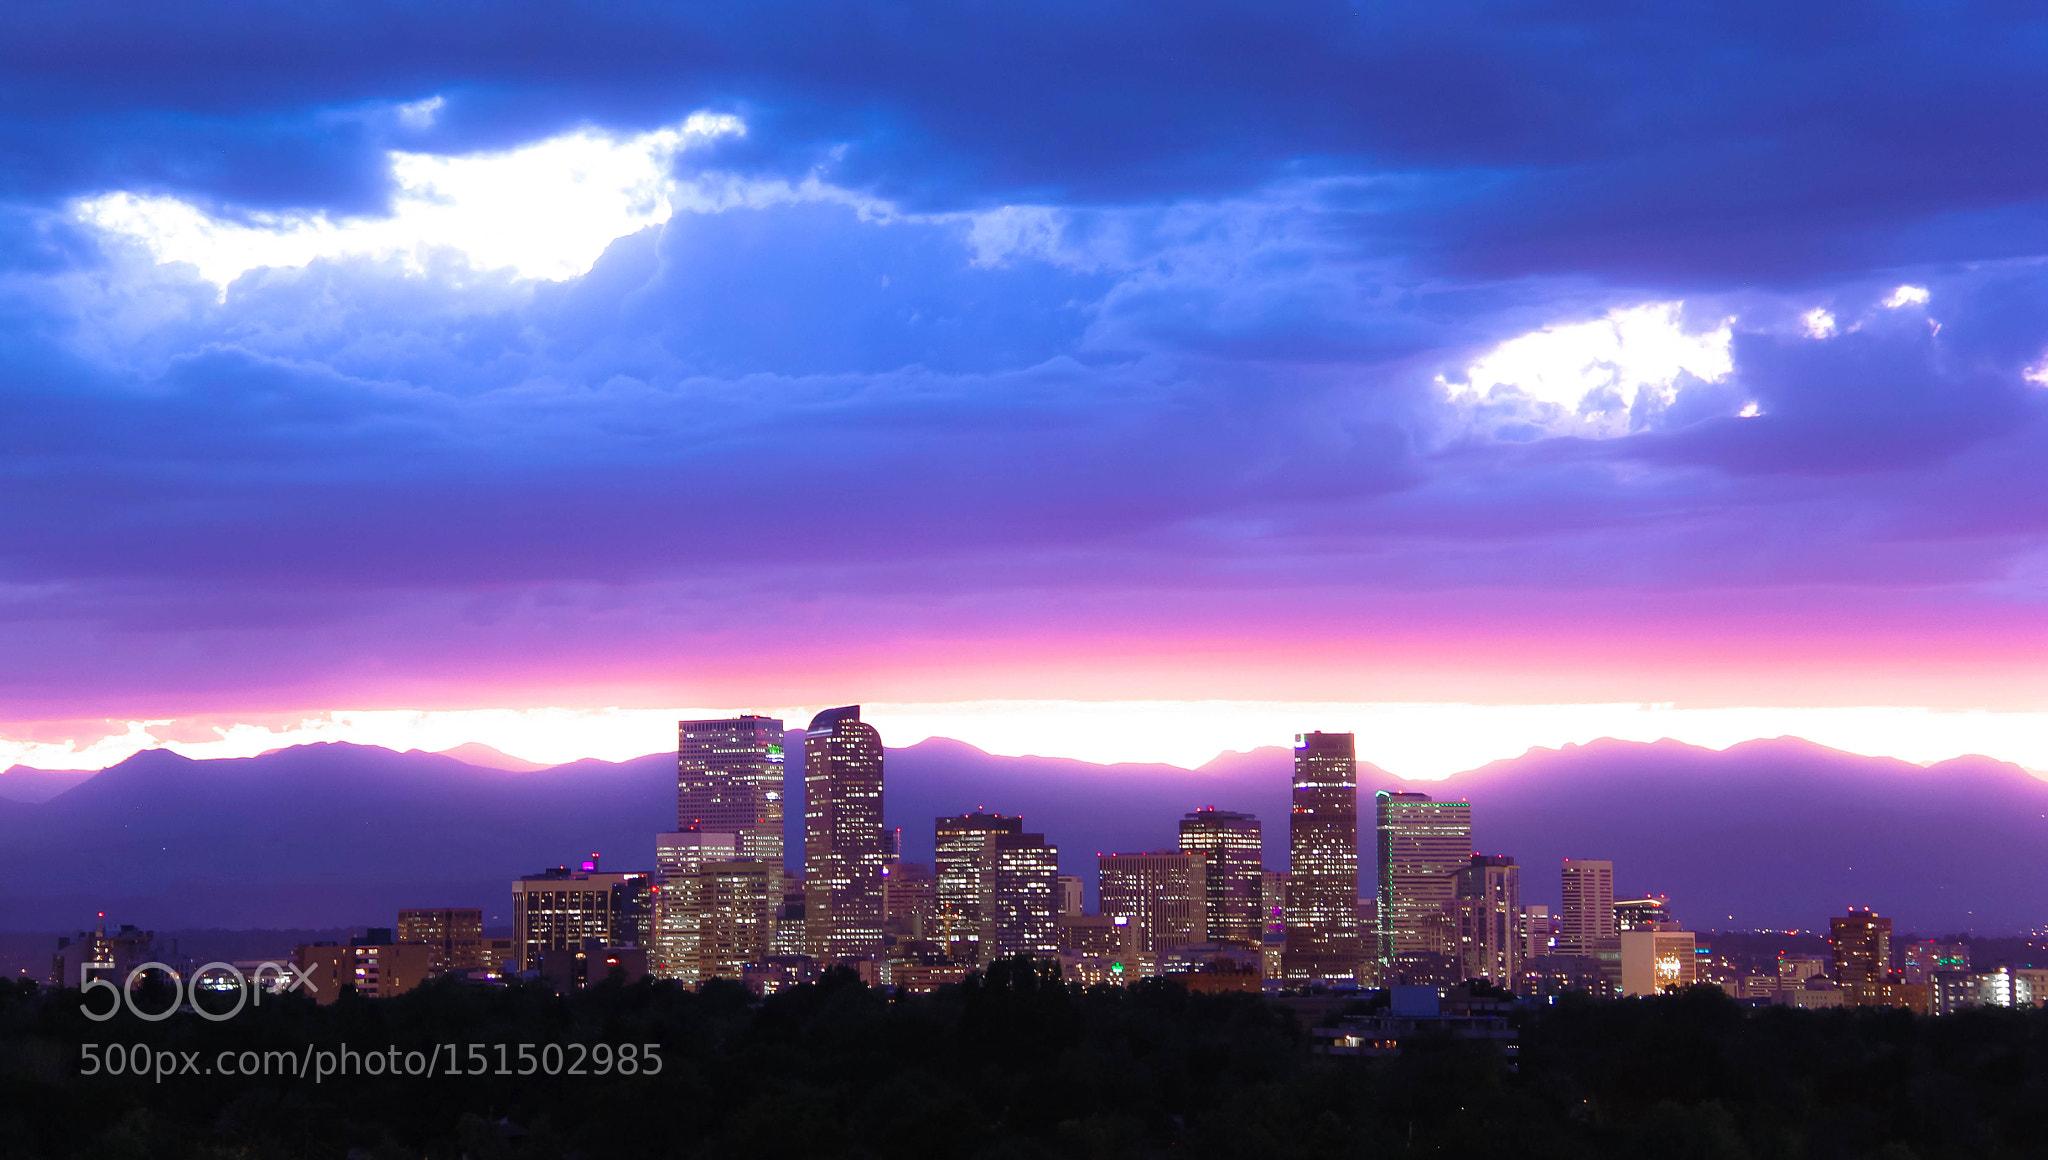 Neon lavender clouds above Denver